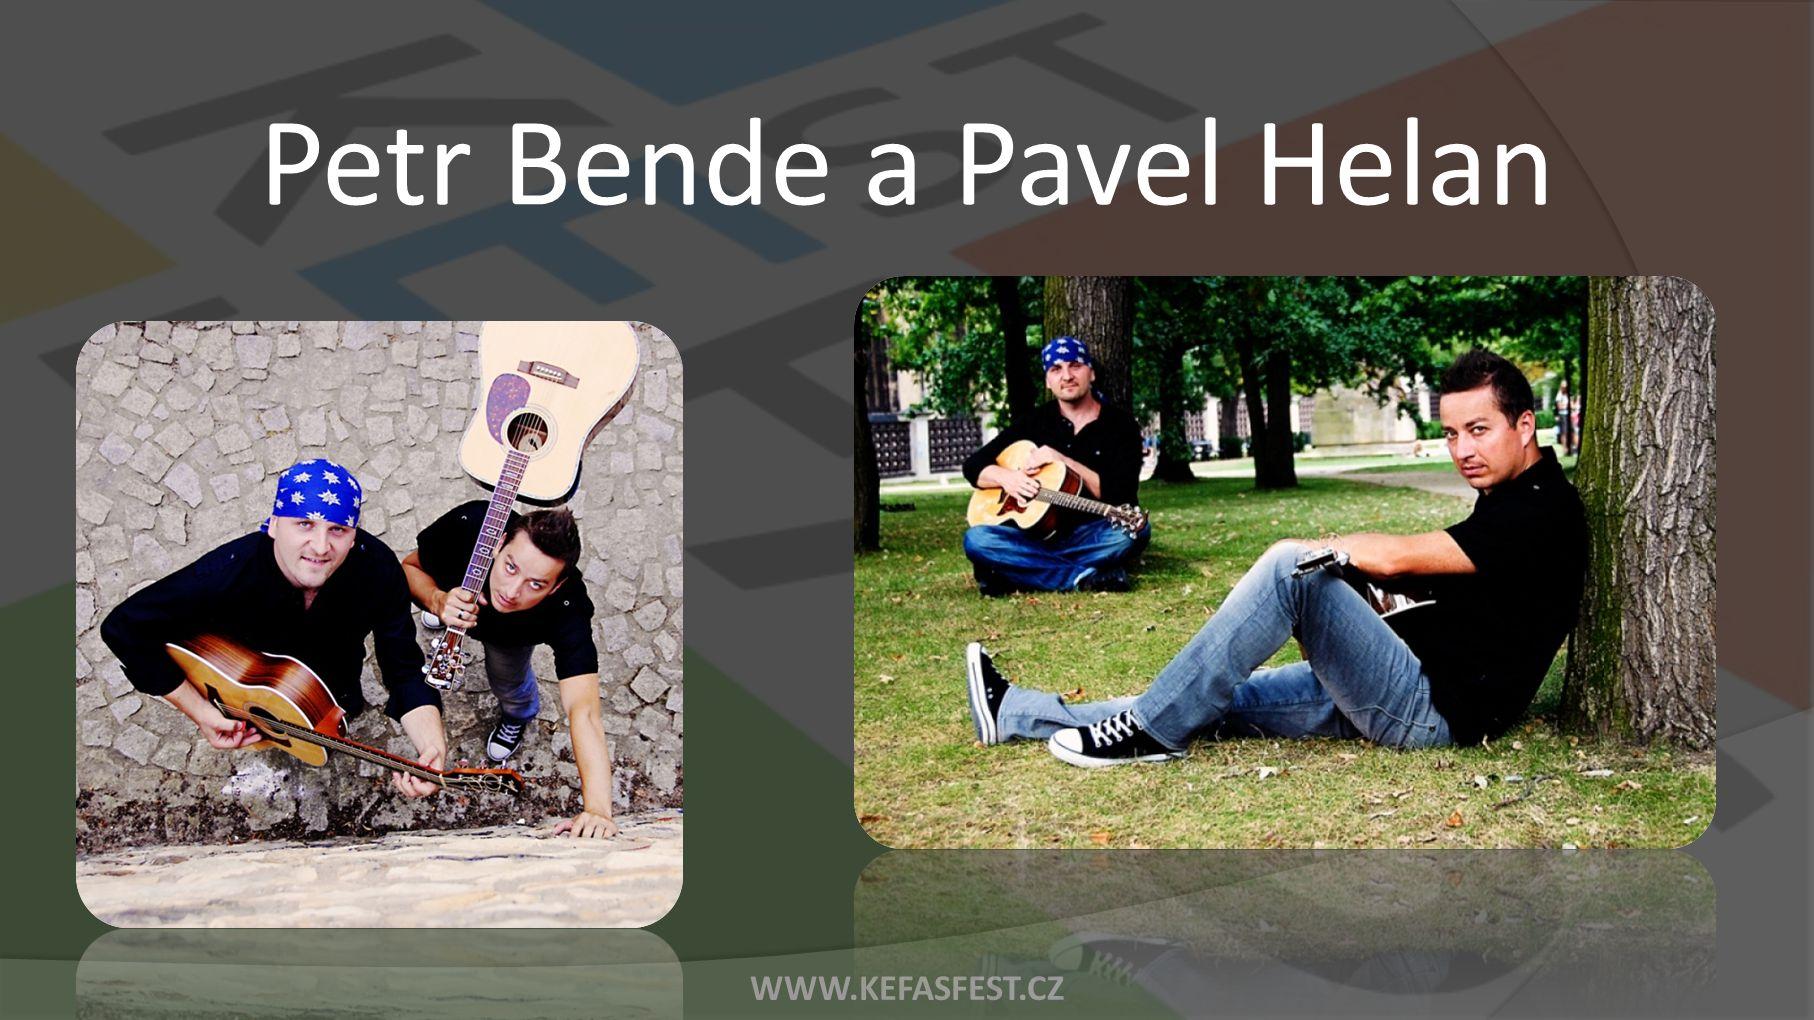 WWW.KEFASFEST.CZ Petr Bende a Pavel Helan